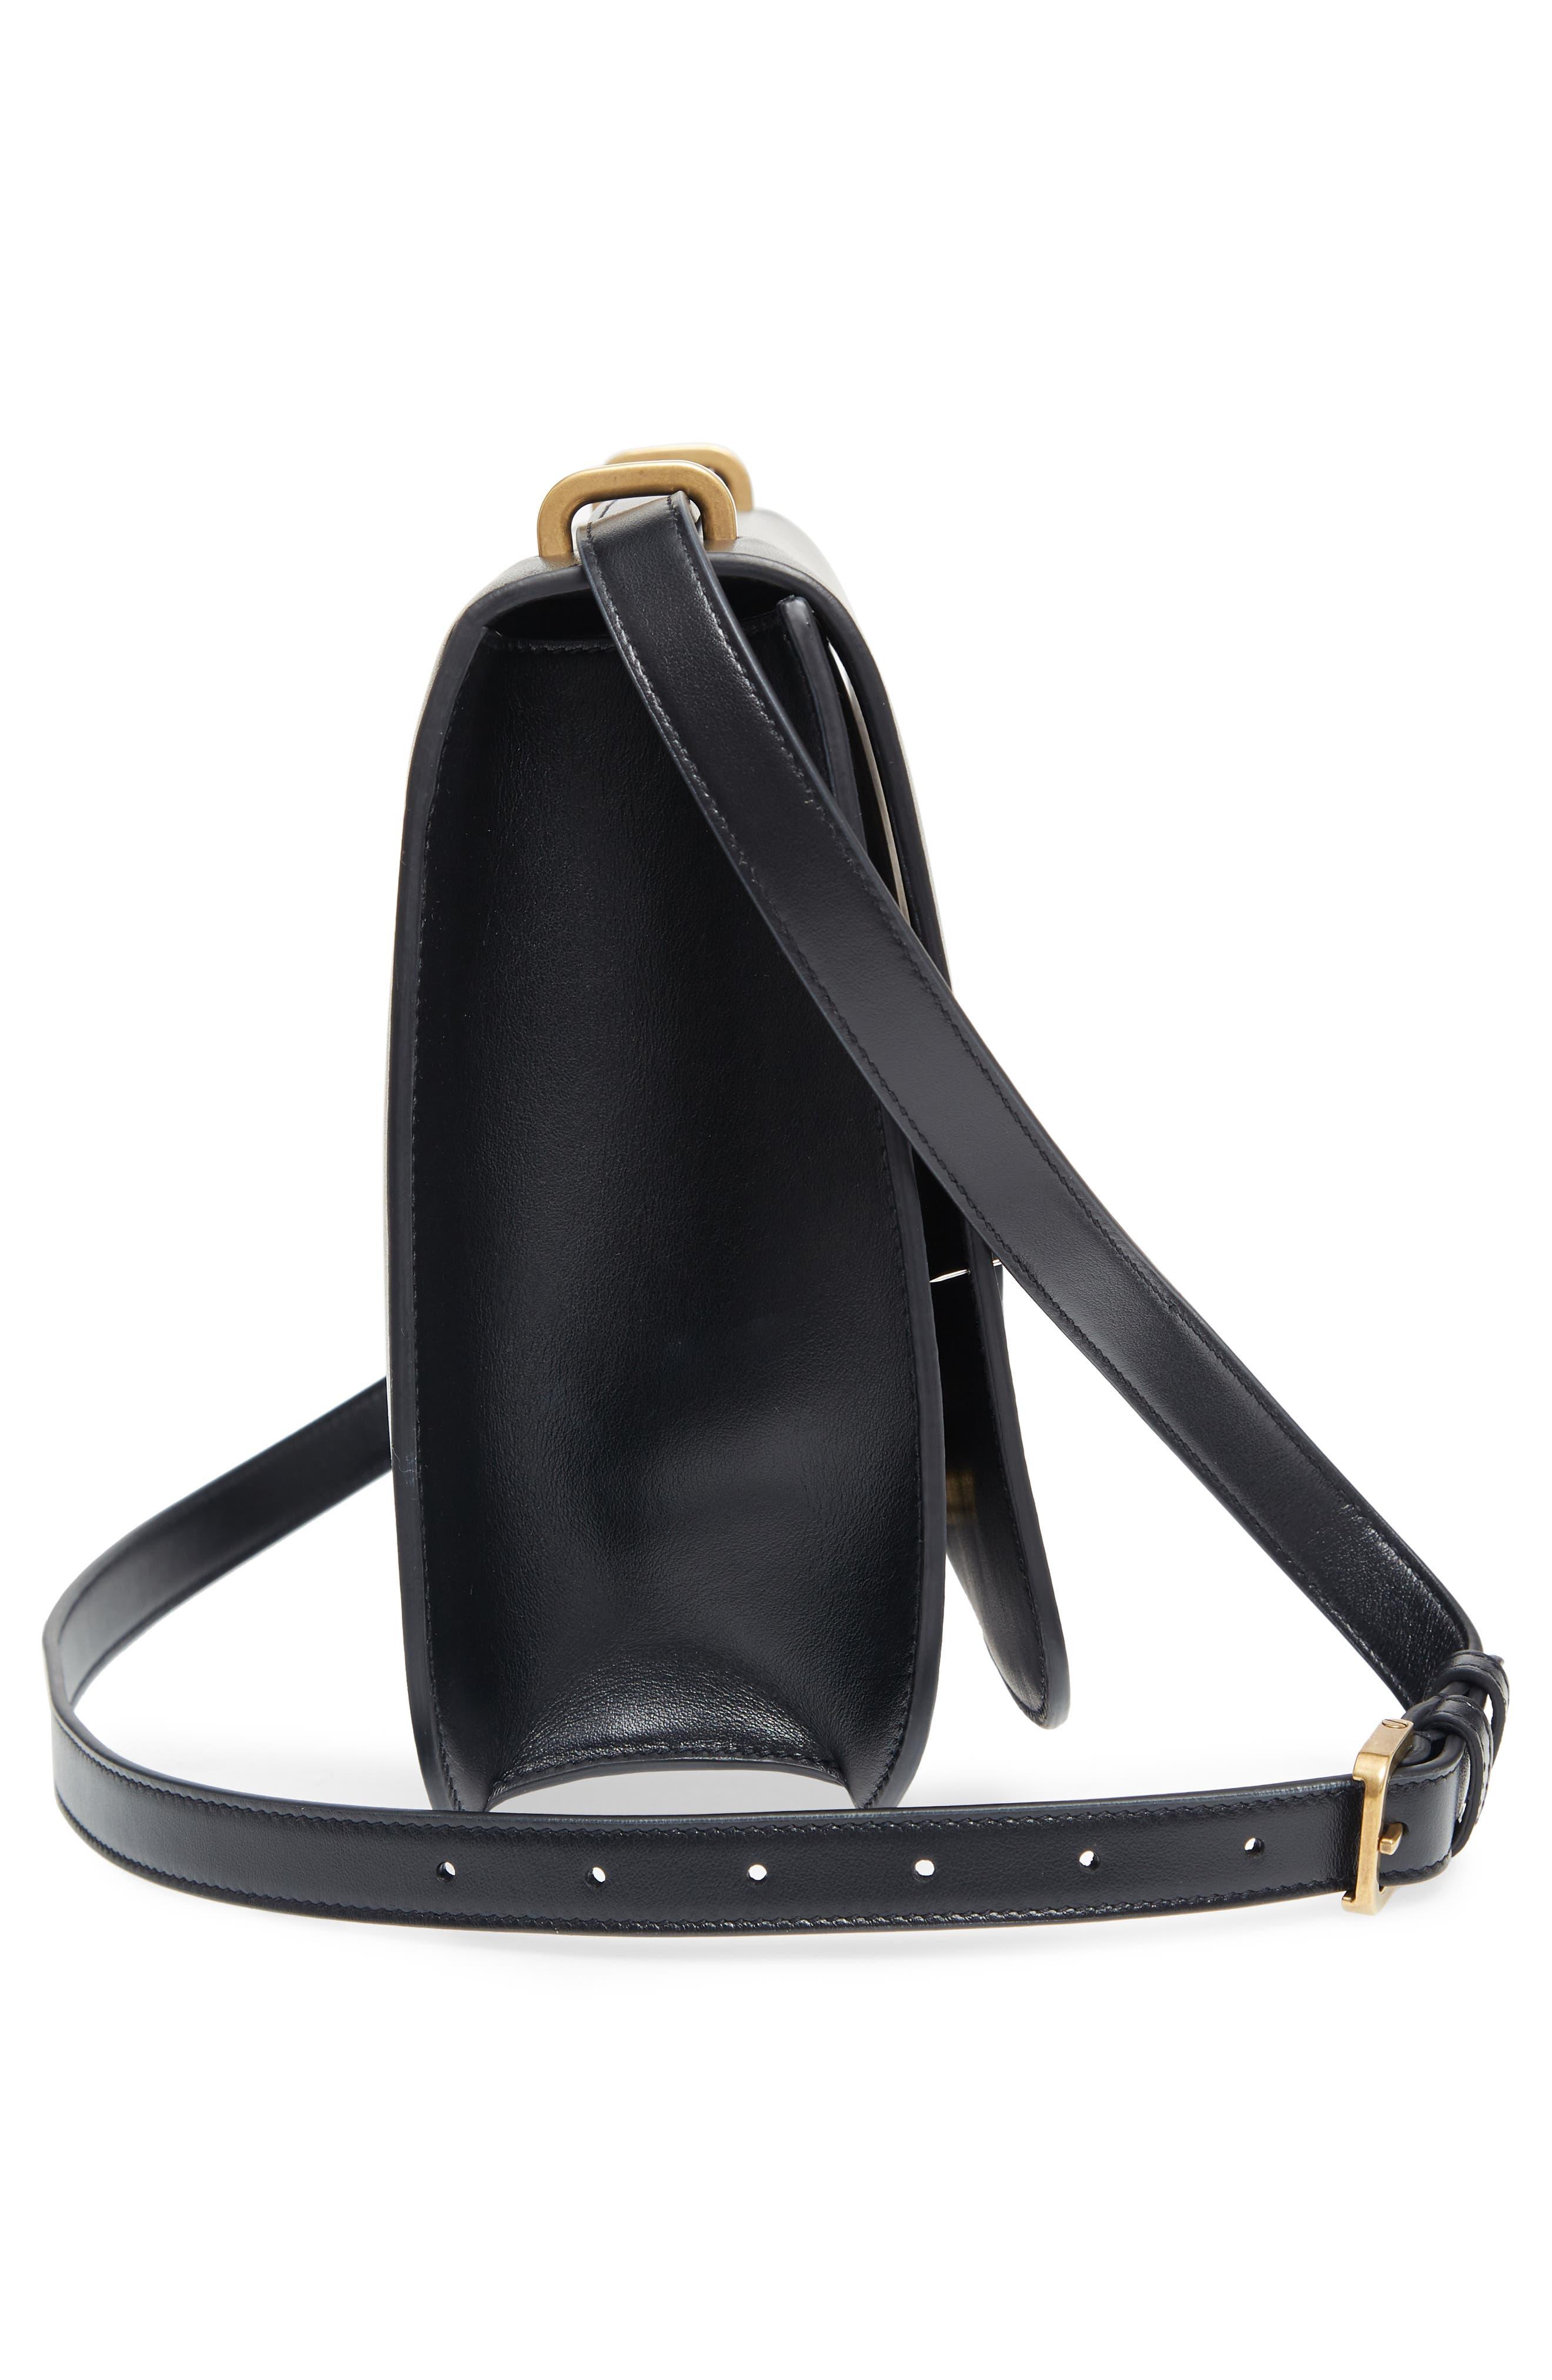 Medium Spontini Leather Shoulder Bag,                             Alternate thumbnail 5, color,                             NERO